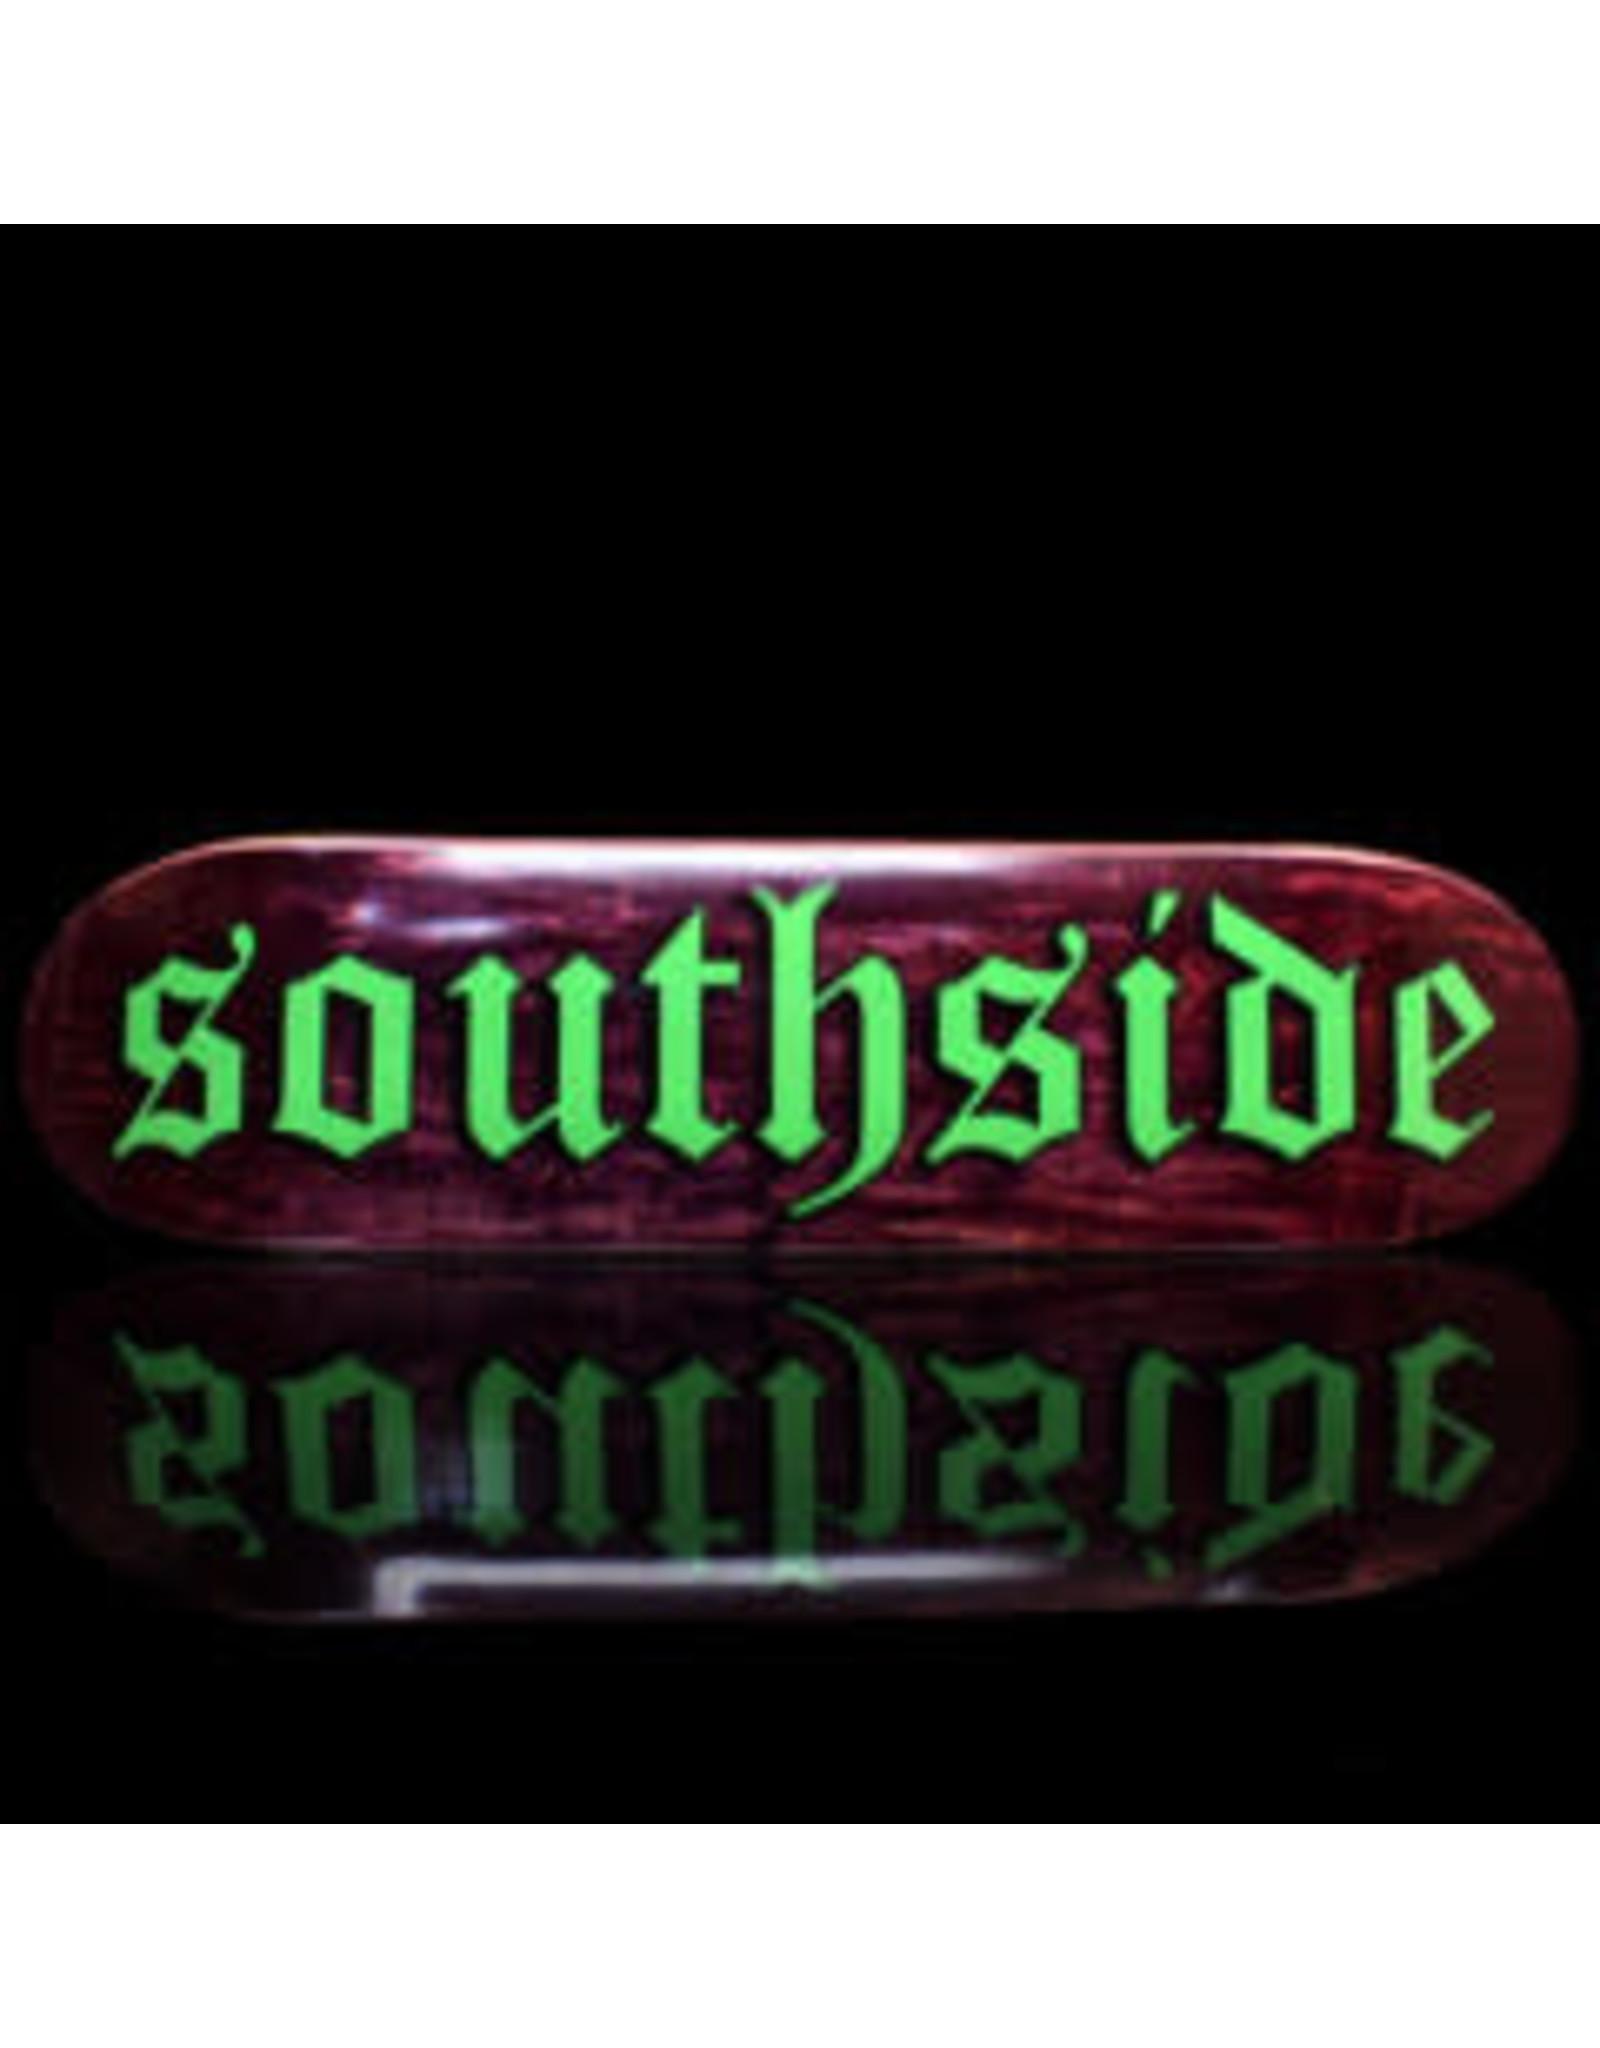 Southside Southside OE Deck Various Stained Veneer 8.5x31.9 BLUNT Shape